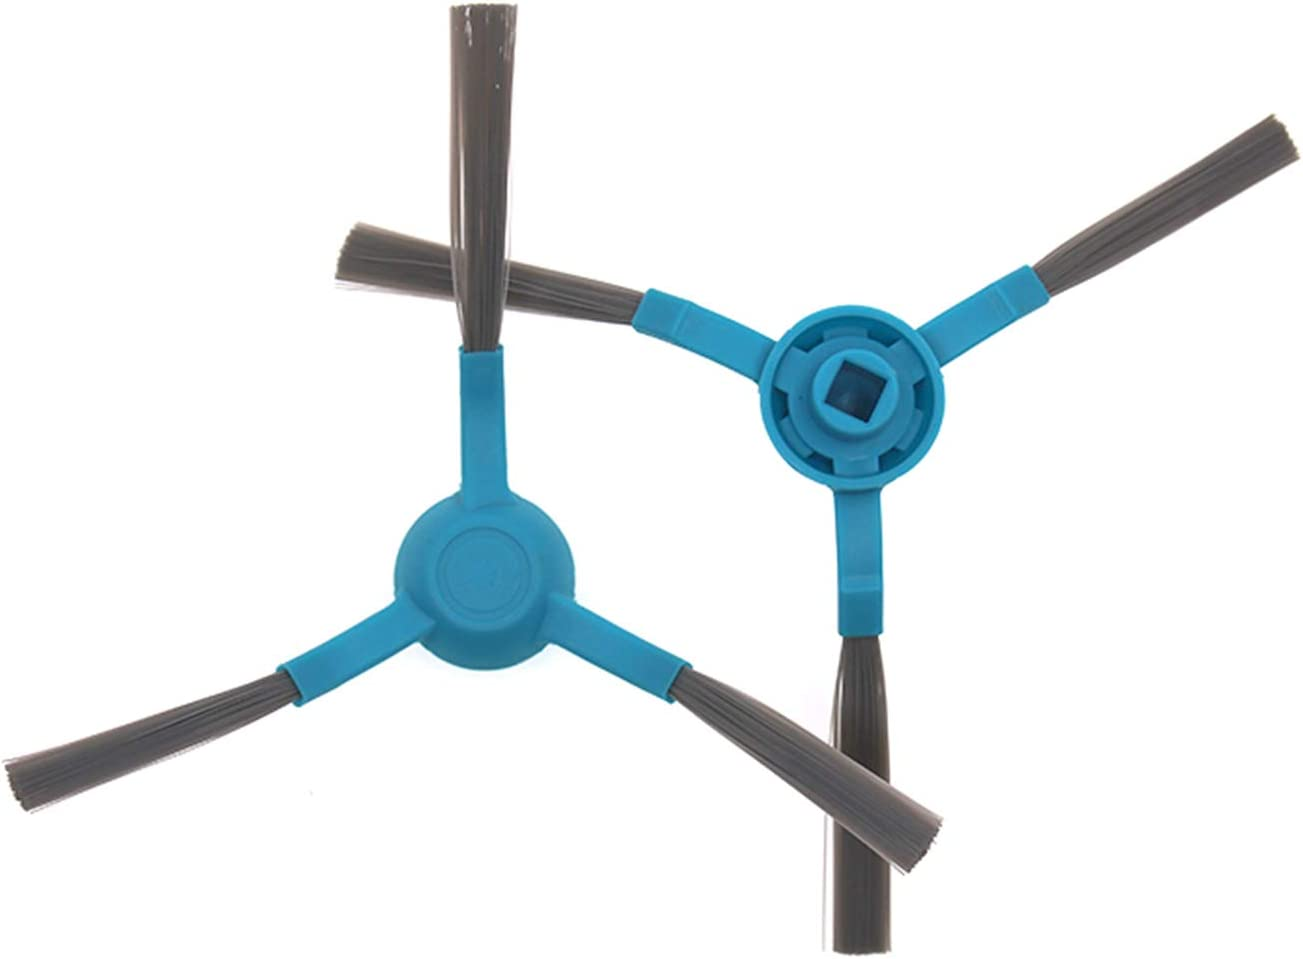 Zealing para Conga 3490 Elite robótica aspiradora recambios: 8 cepillos Laterales,1 Cepillo Central,4 Paño de Repuesto Mojado: Amazon.es: Hogar